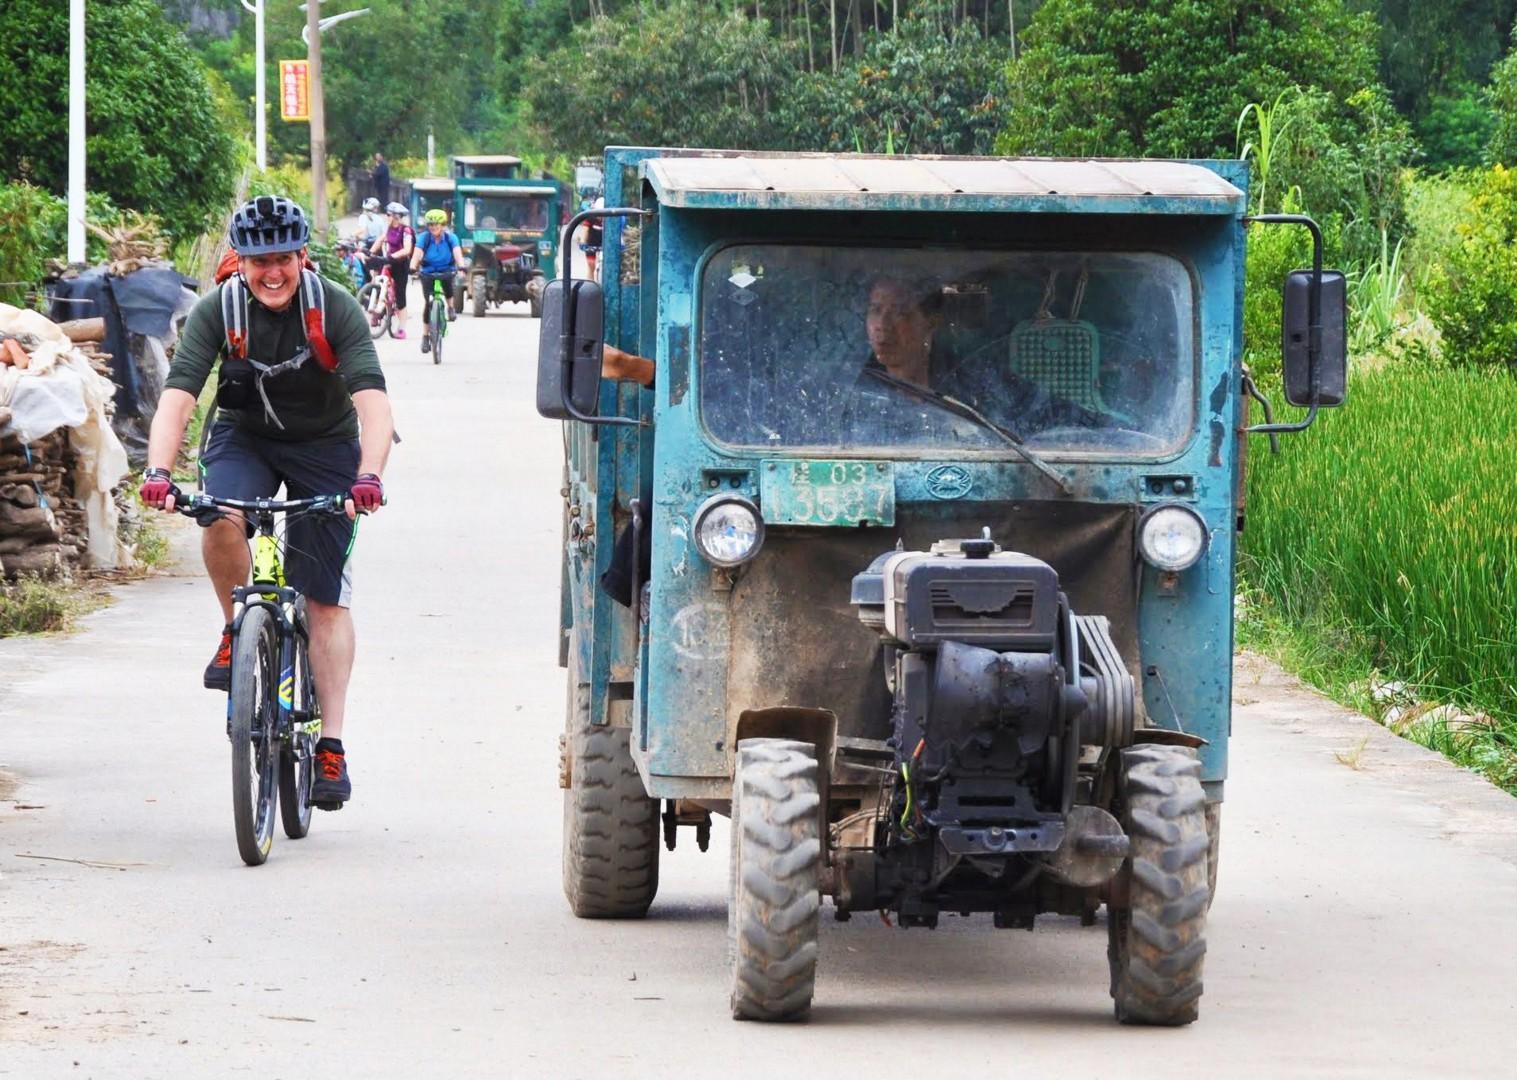 001-098.jpg - China - Guilin and Guangxi - Cycling Adventures